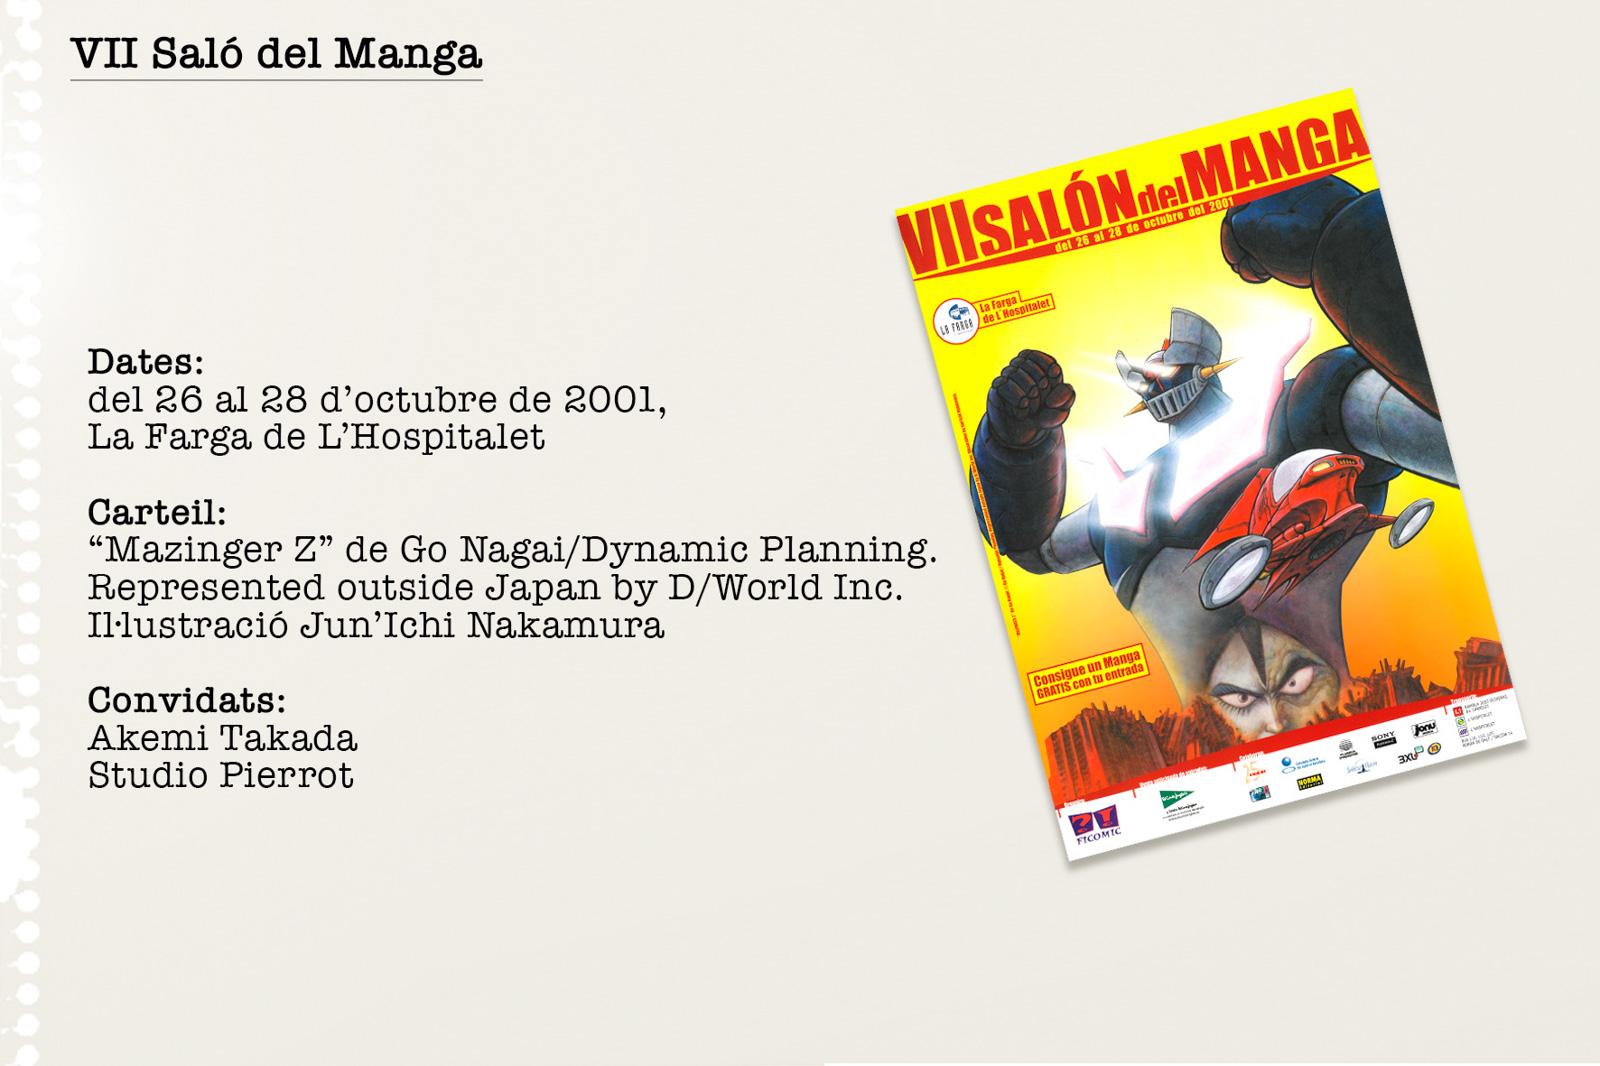 VII - Go Nagai/Jun Ichi Nakamura